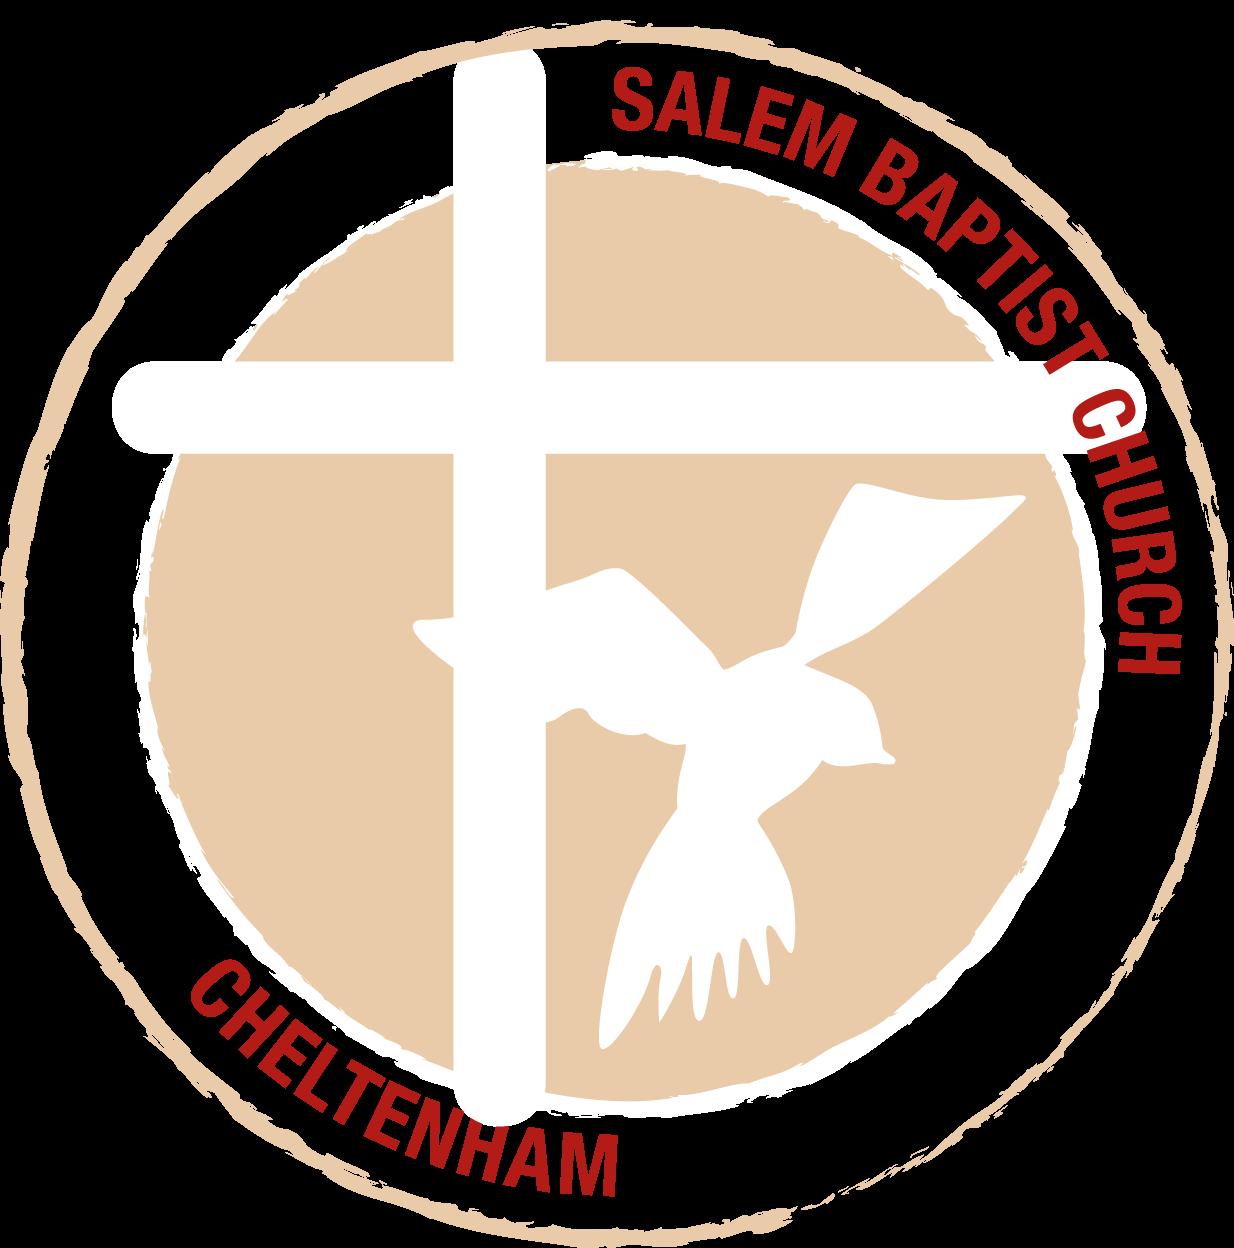 Salem Baptist Church, Cheltenham